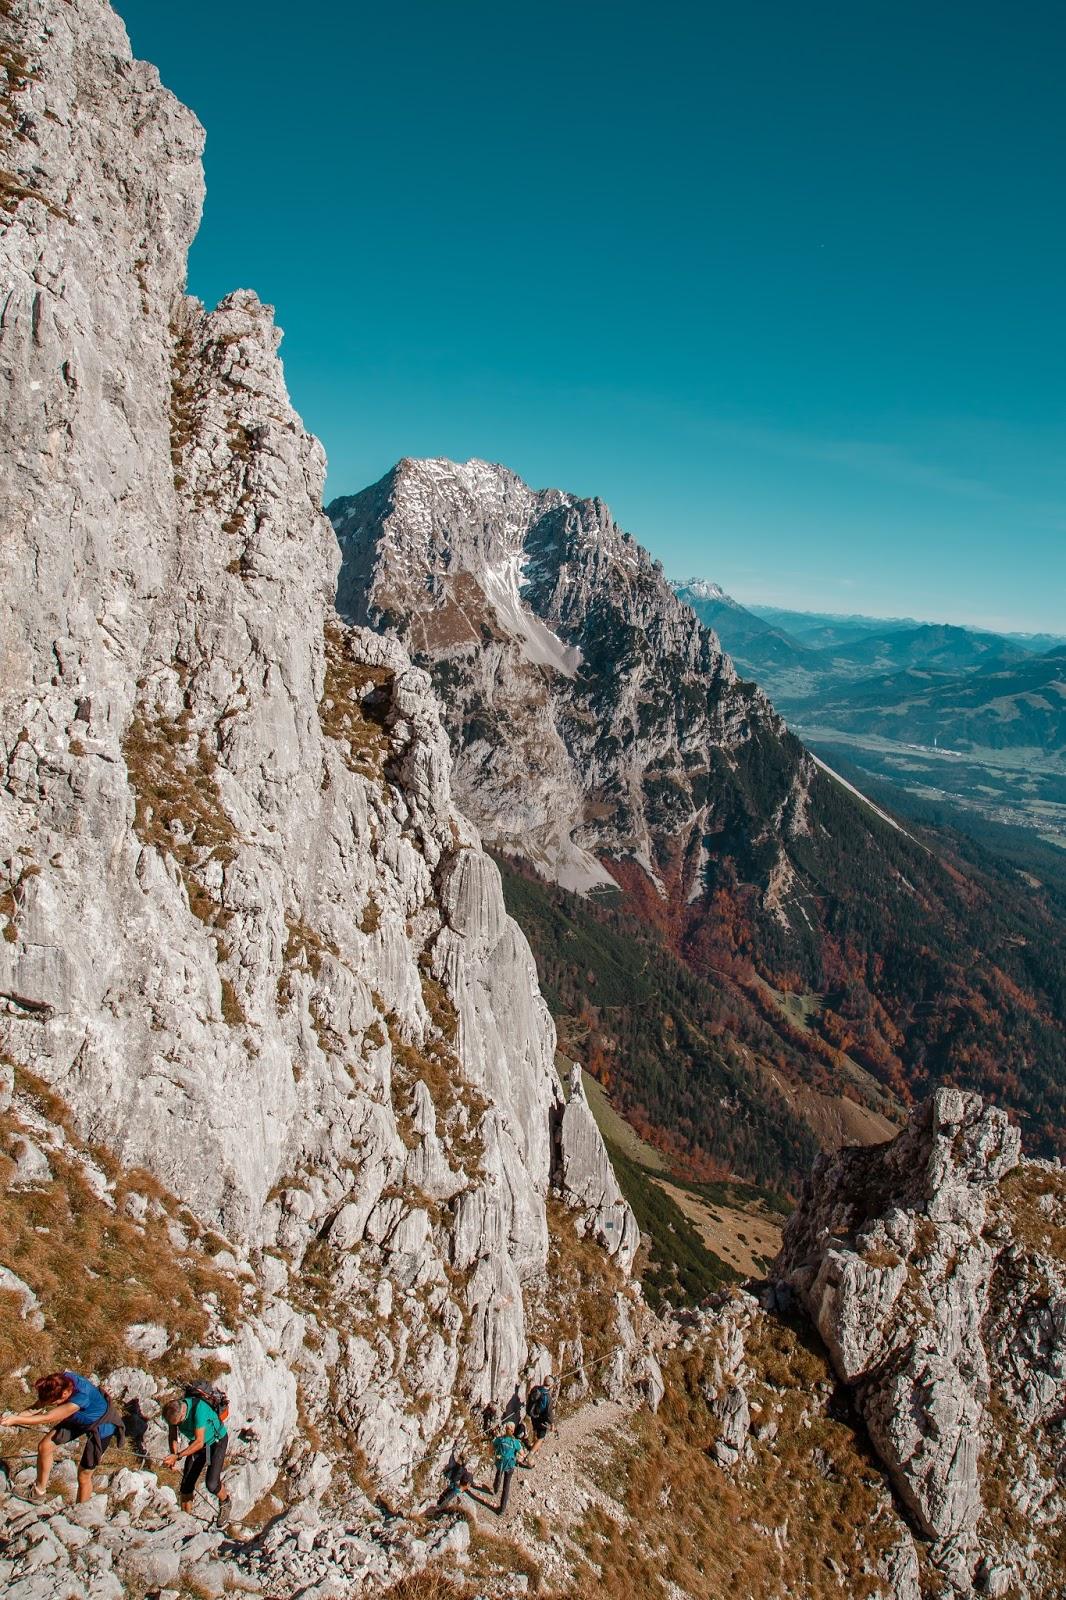 Bergtour Scheffauer  Wandern Wilder Kaiser  leichter Gipfel im Wilden Kaiser  Wandern-Tirol 16